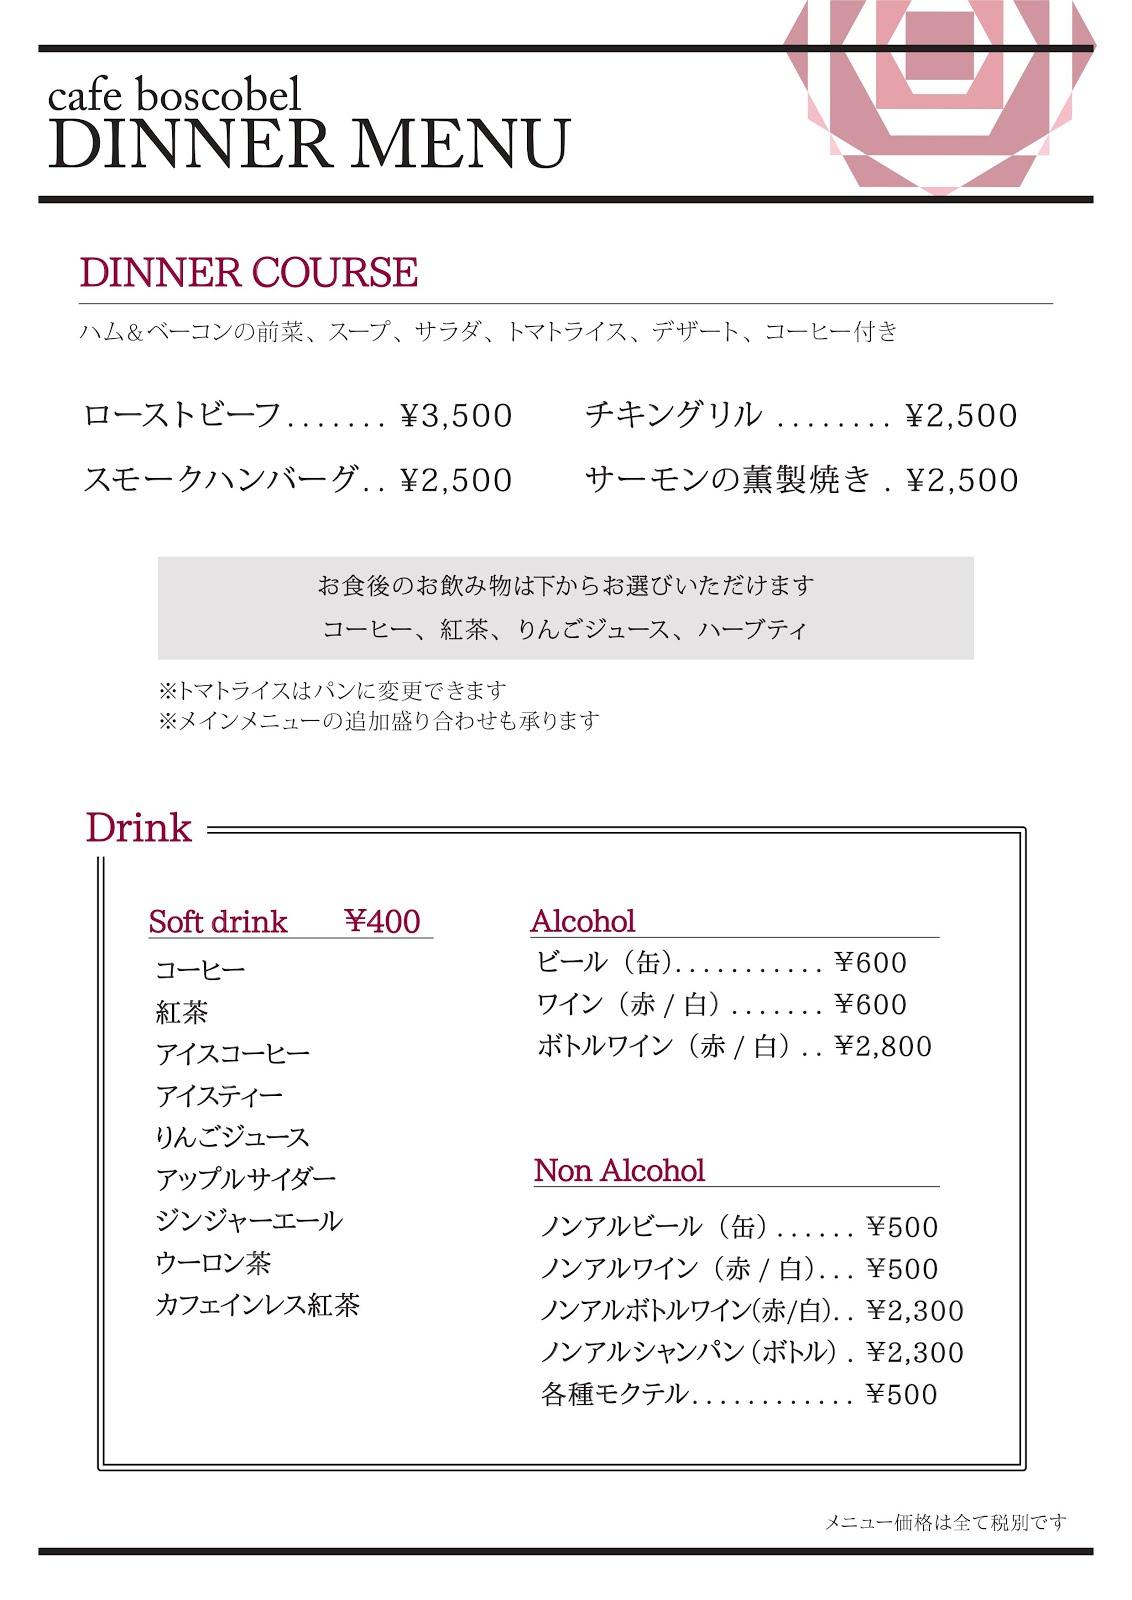 cafe boscobel - dinner menu